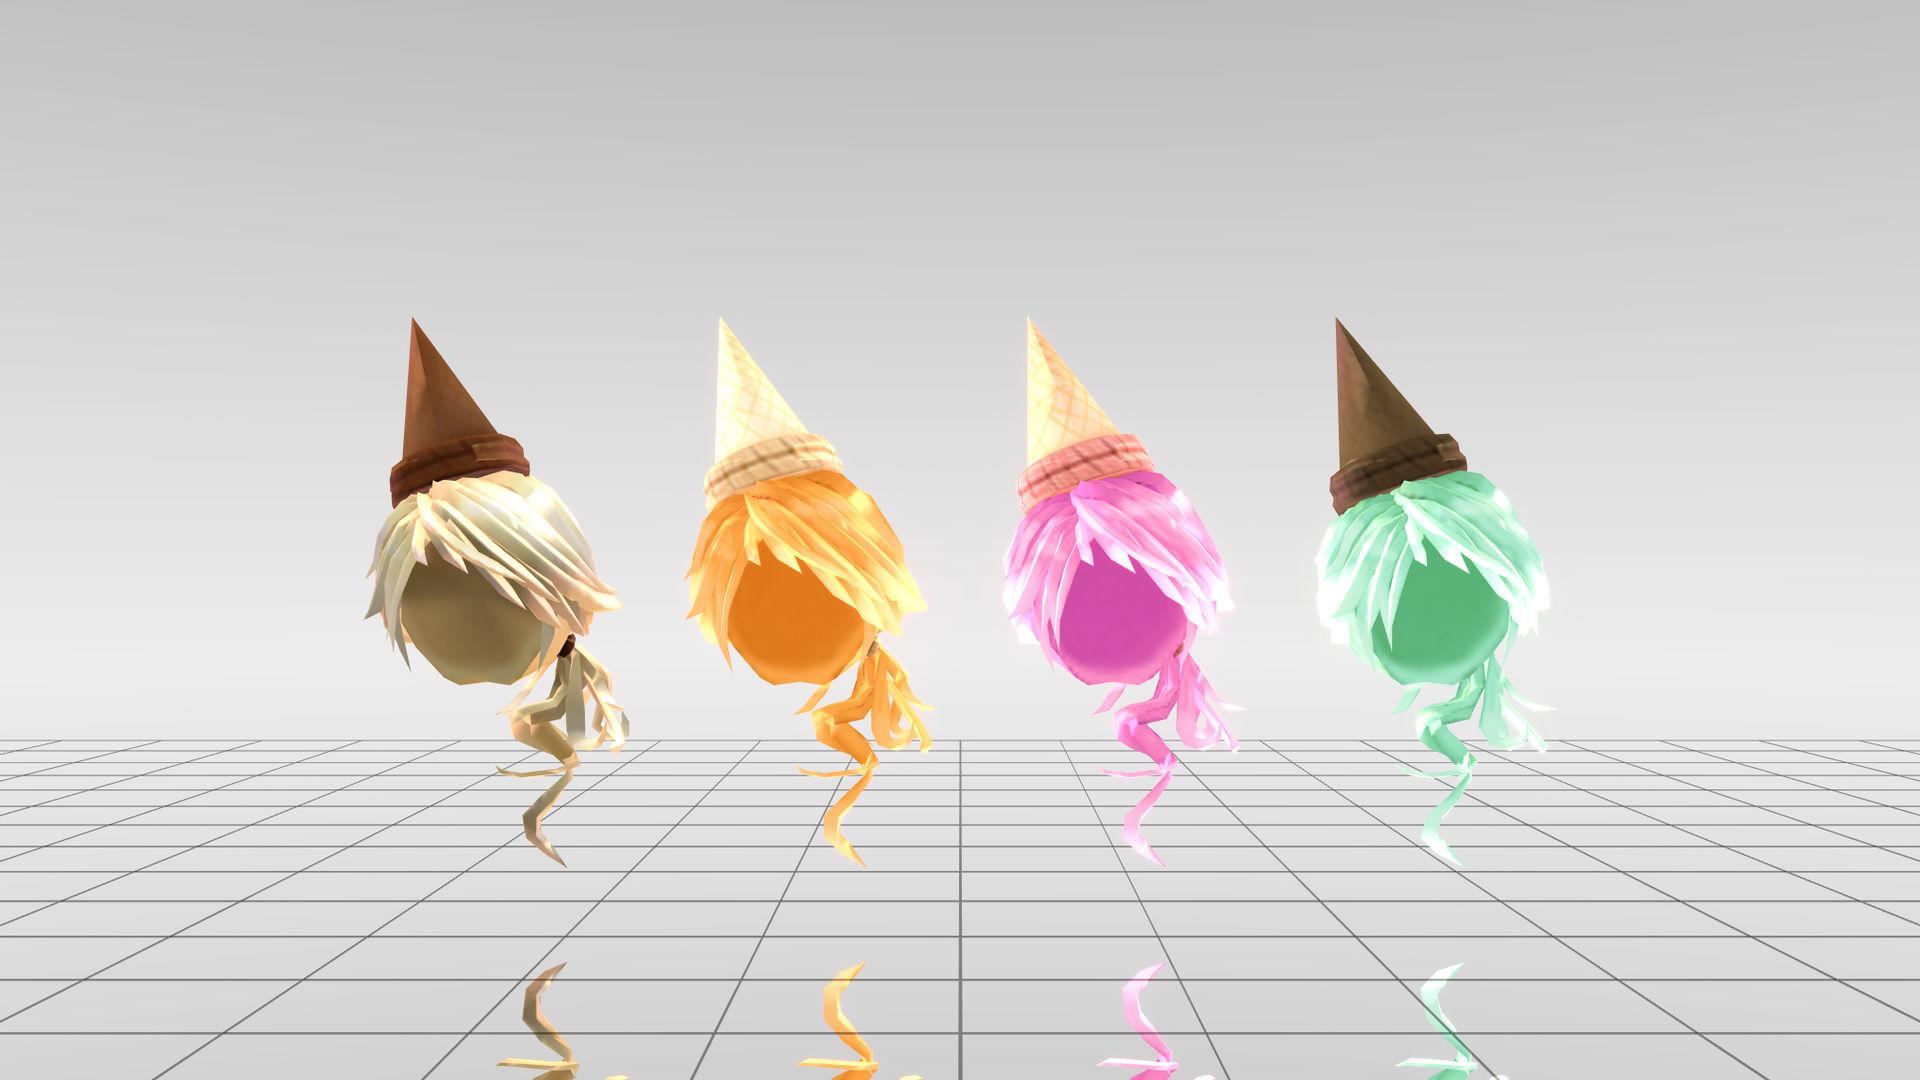 Mmd Roblox Ice Cream Hair Dl By Ona2000 On Deviantart